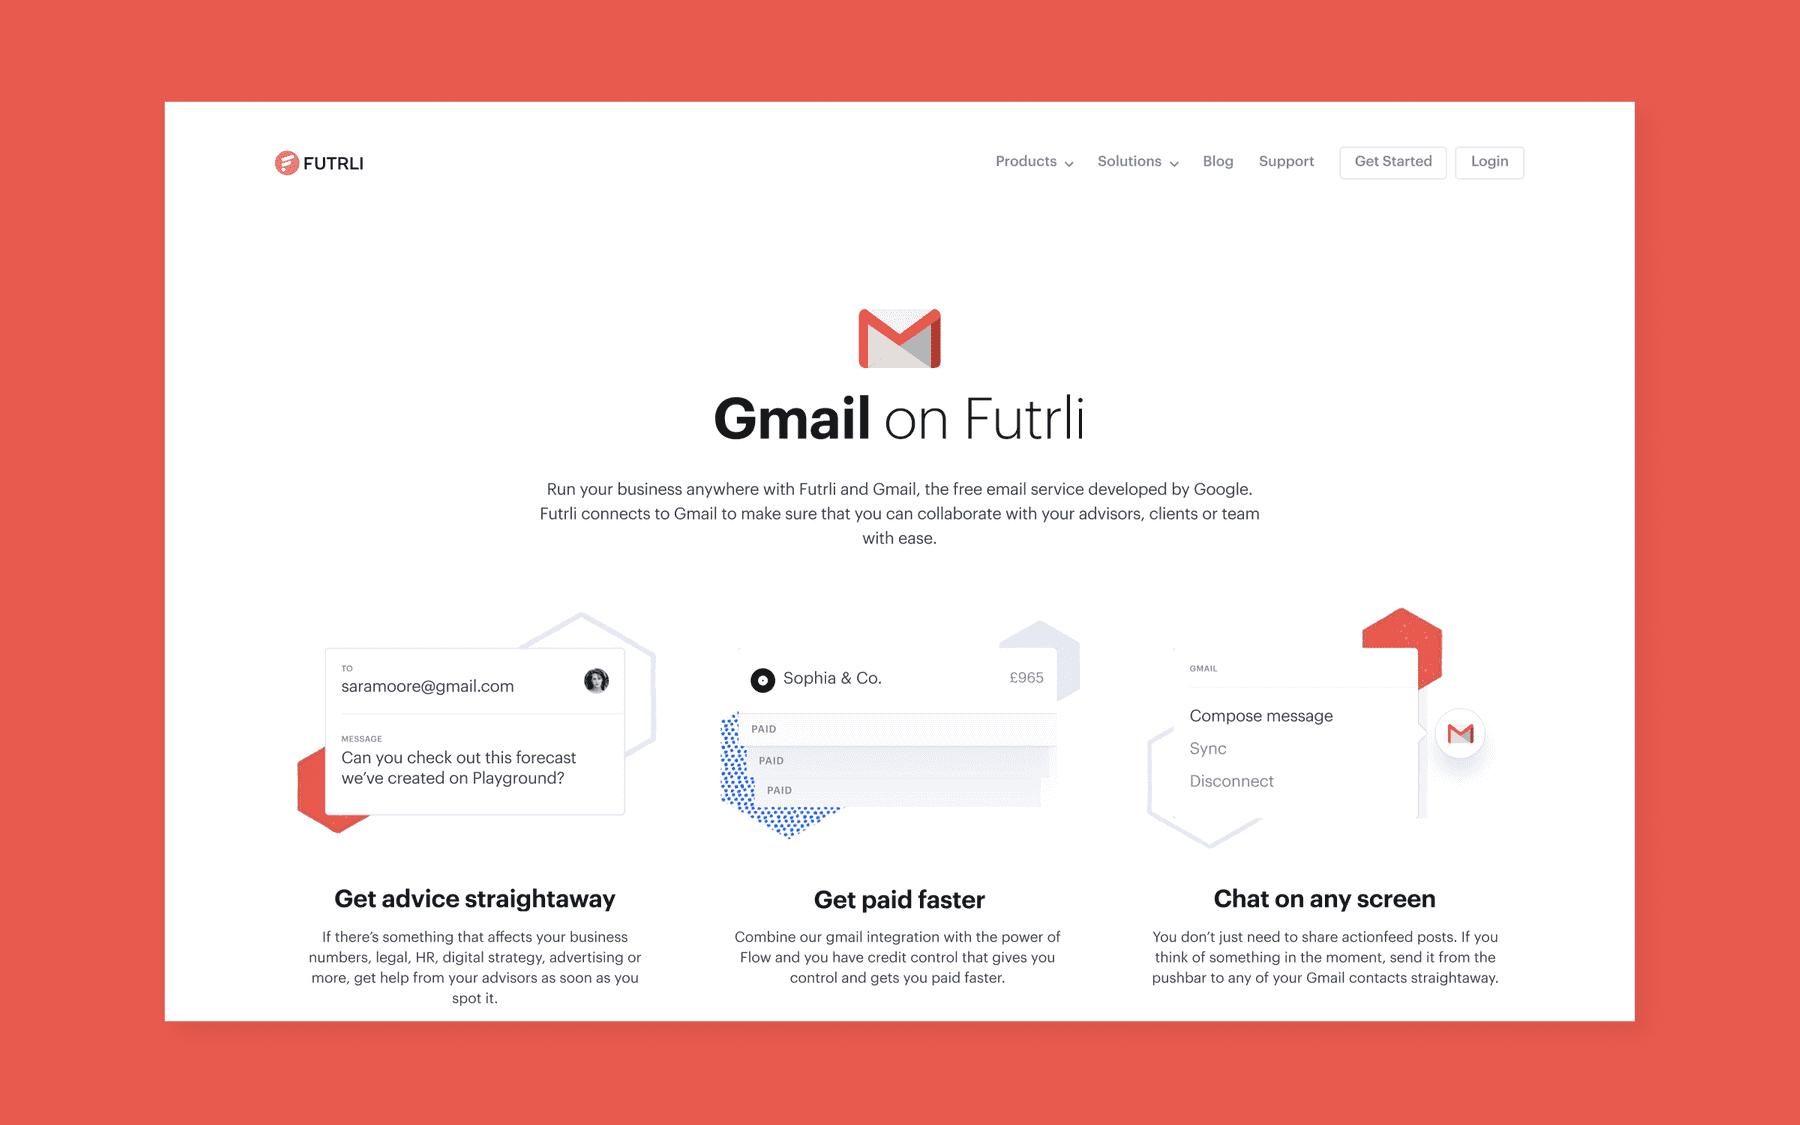 Gmail on Futrli